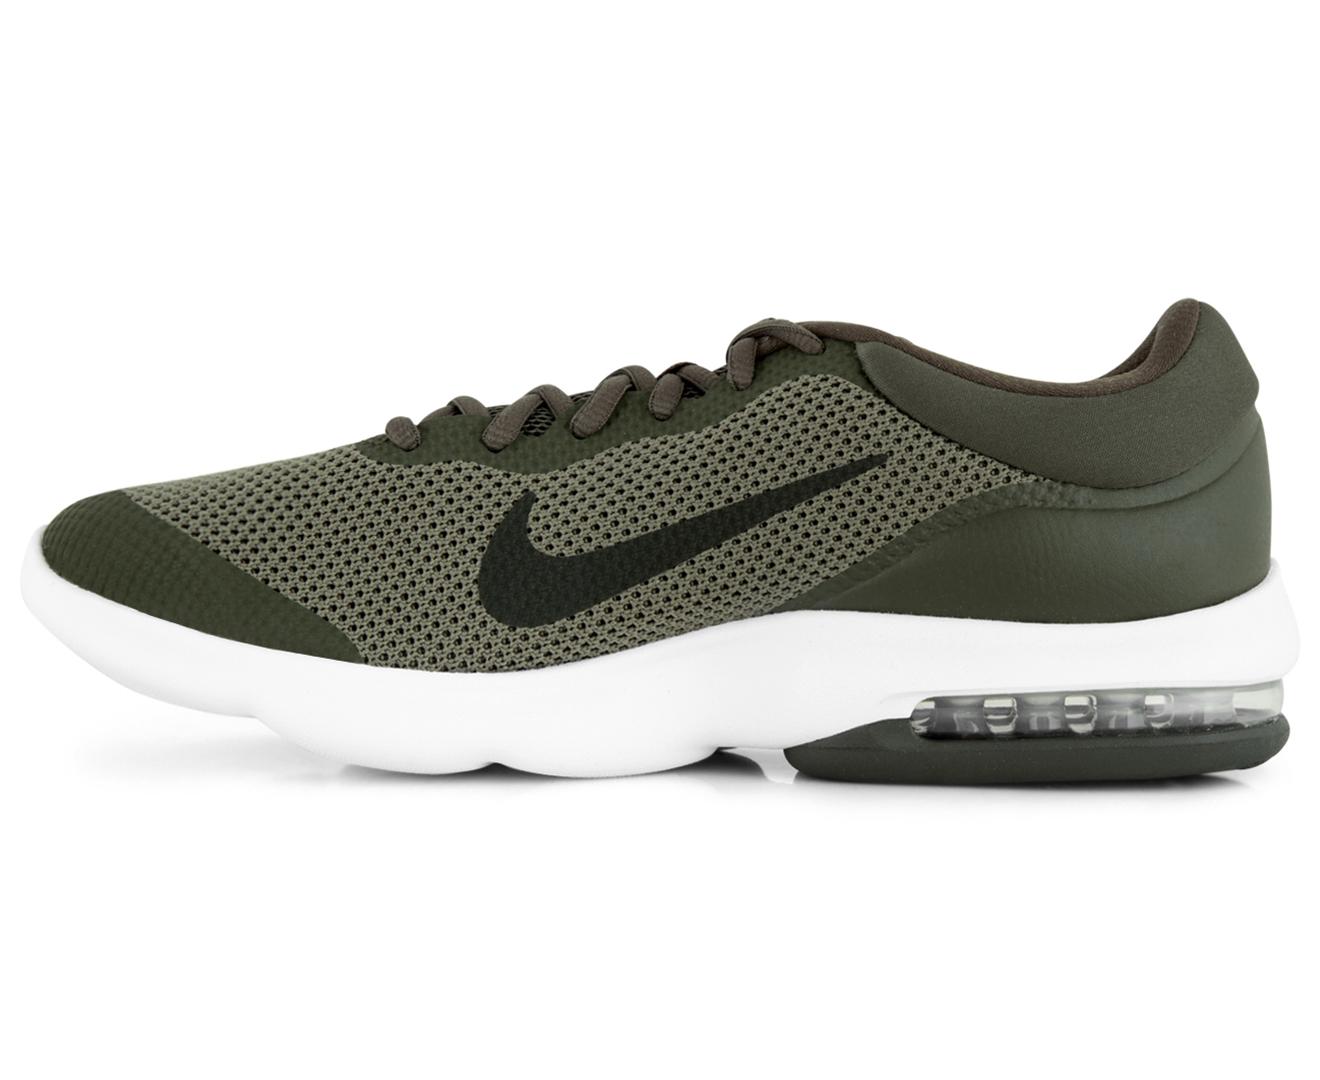 innovative design 679ca e9f6f Nike Men s Air Max Advantage Shoe - Medium Olive Sequoia